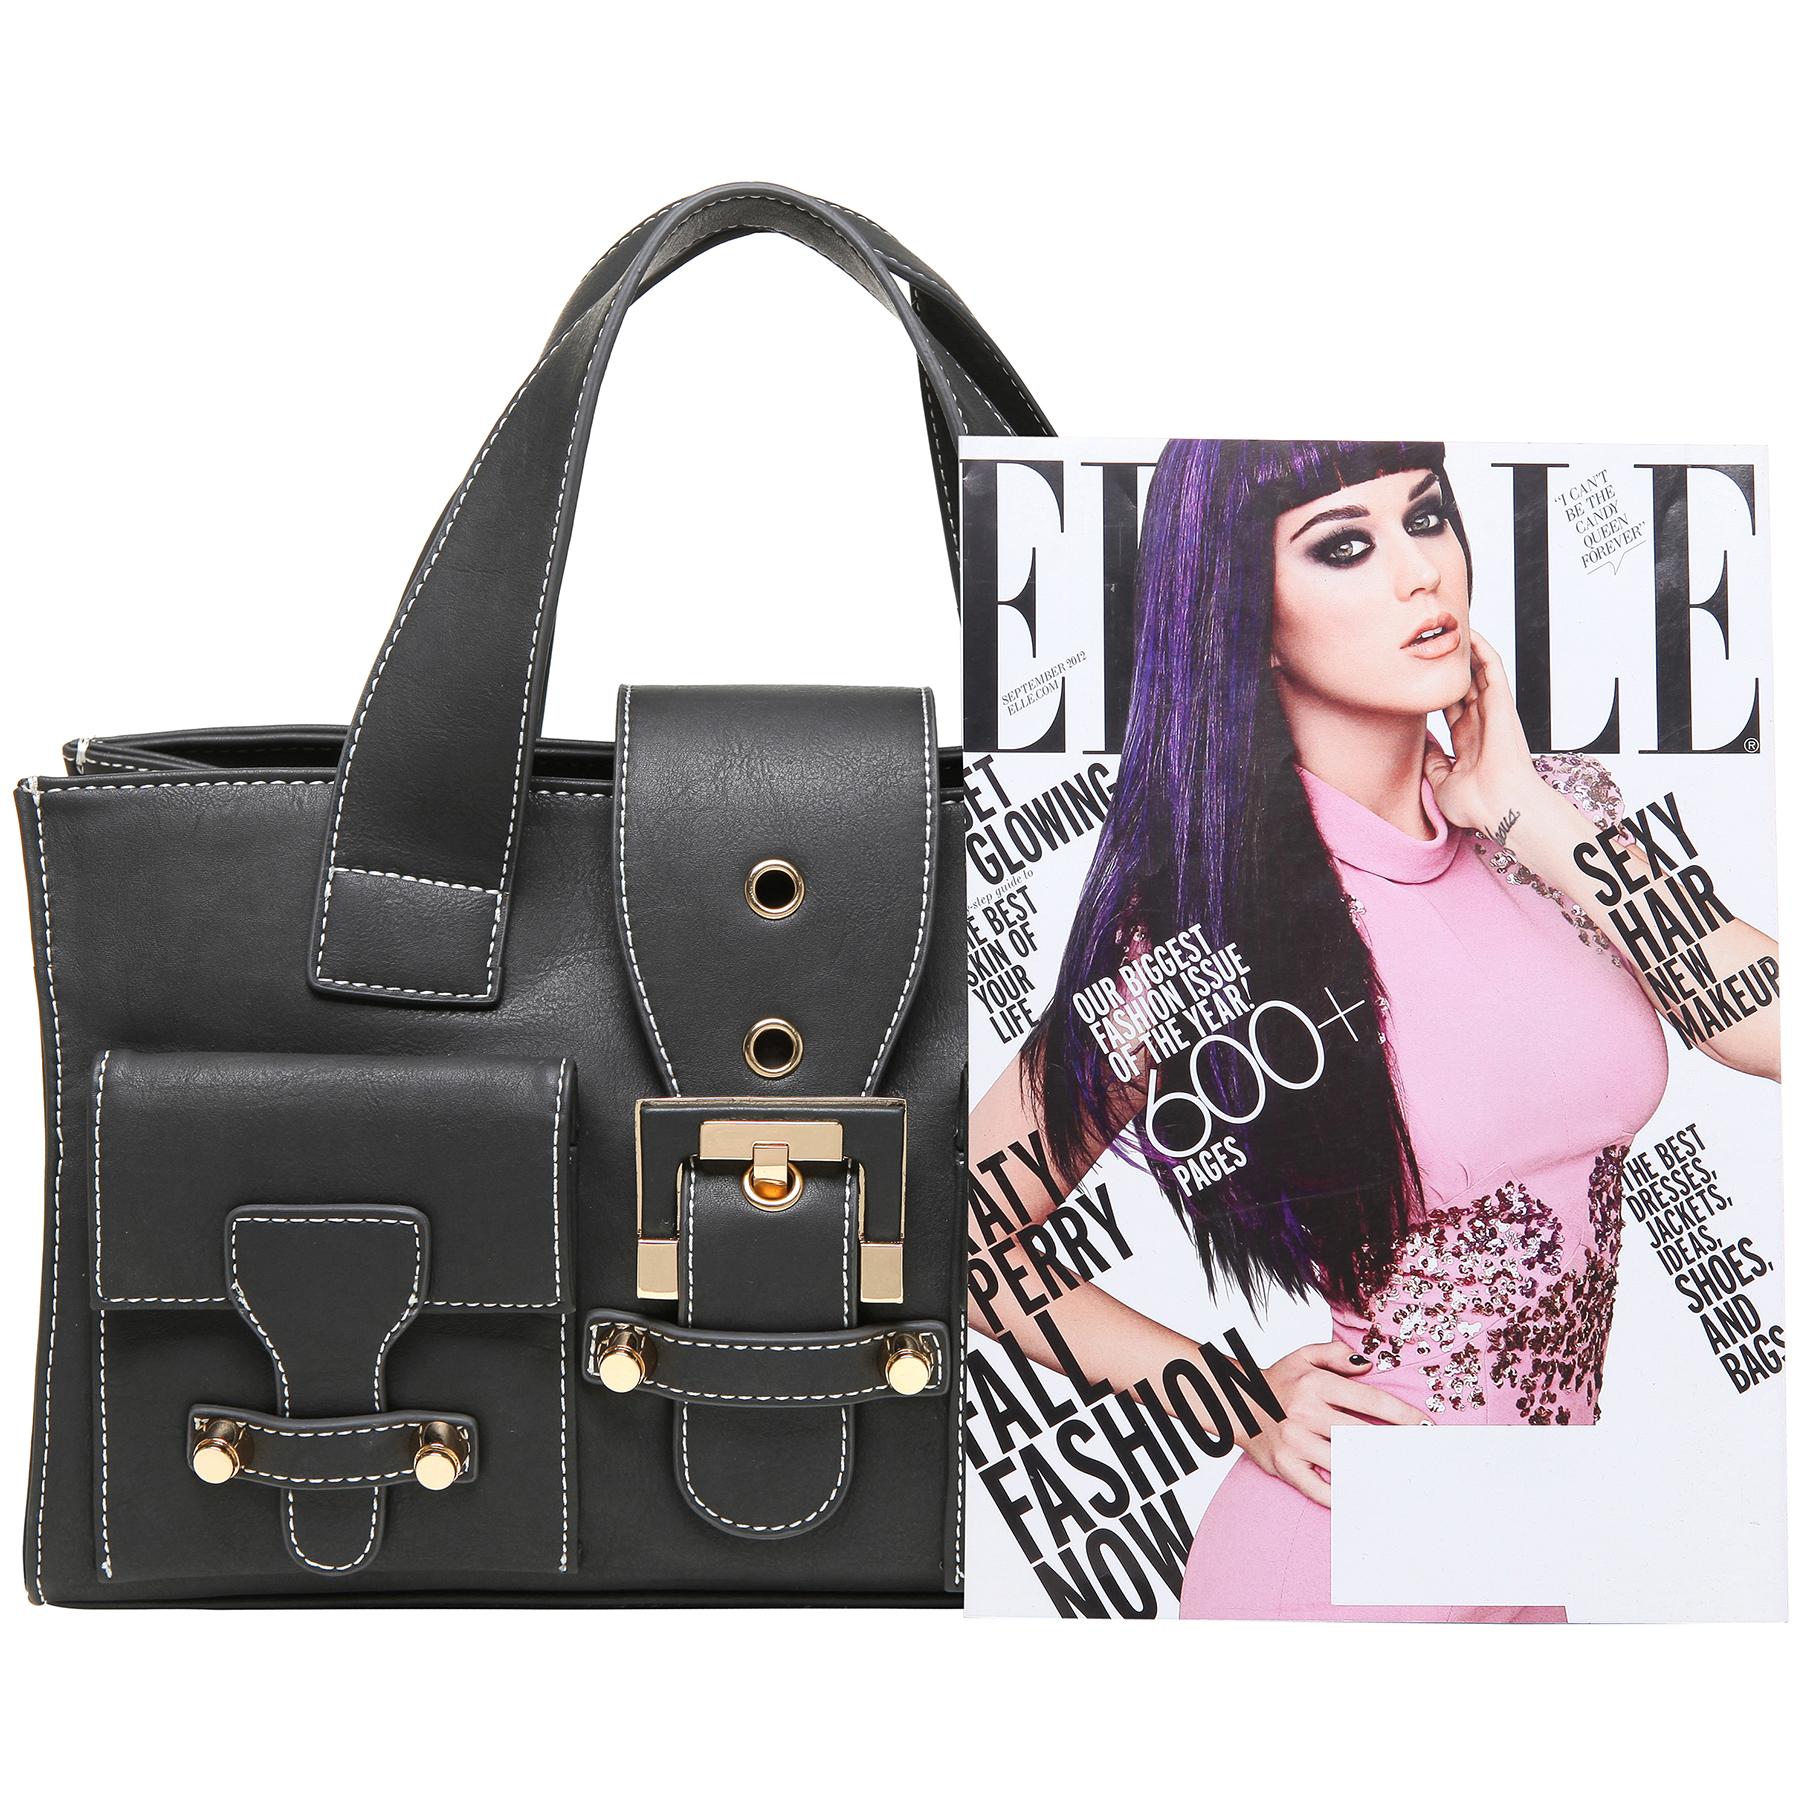 Anna Onyx Black satchel style womens designer handbag size comparison image